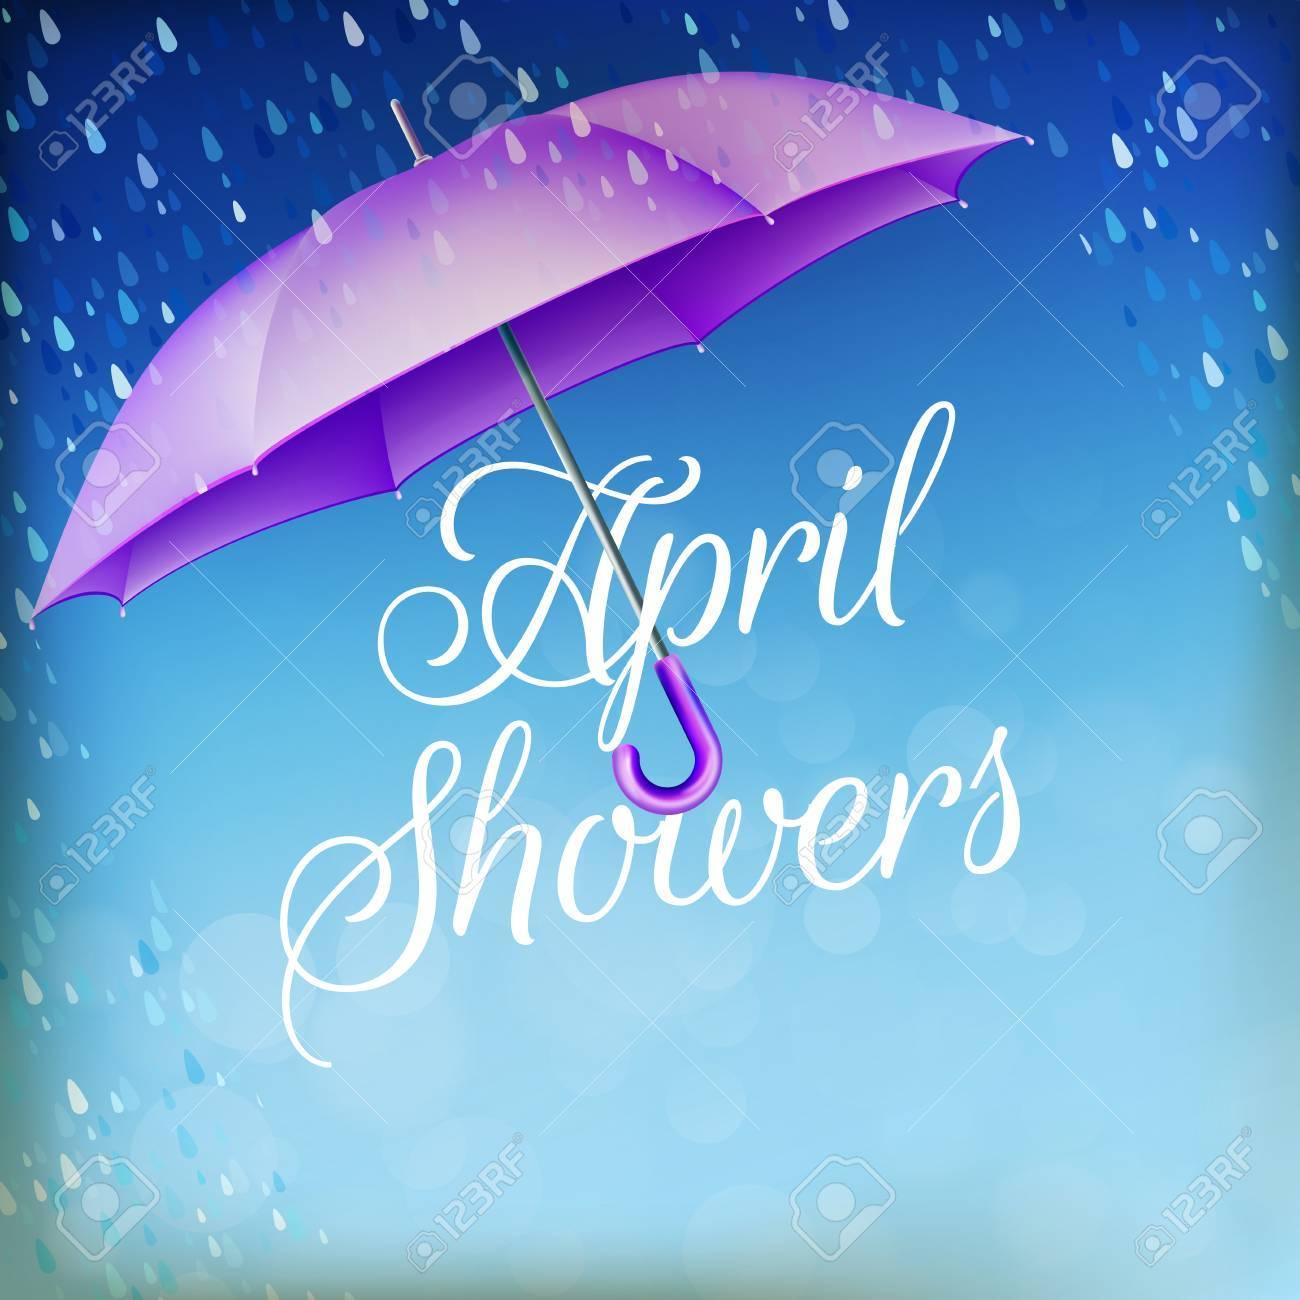 Umbrella in the rain. - 55339018